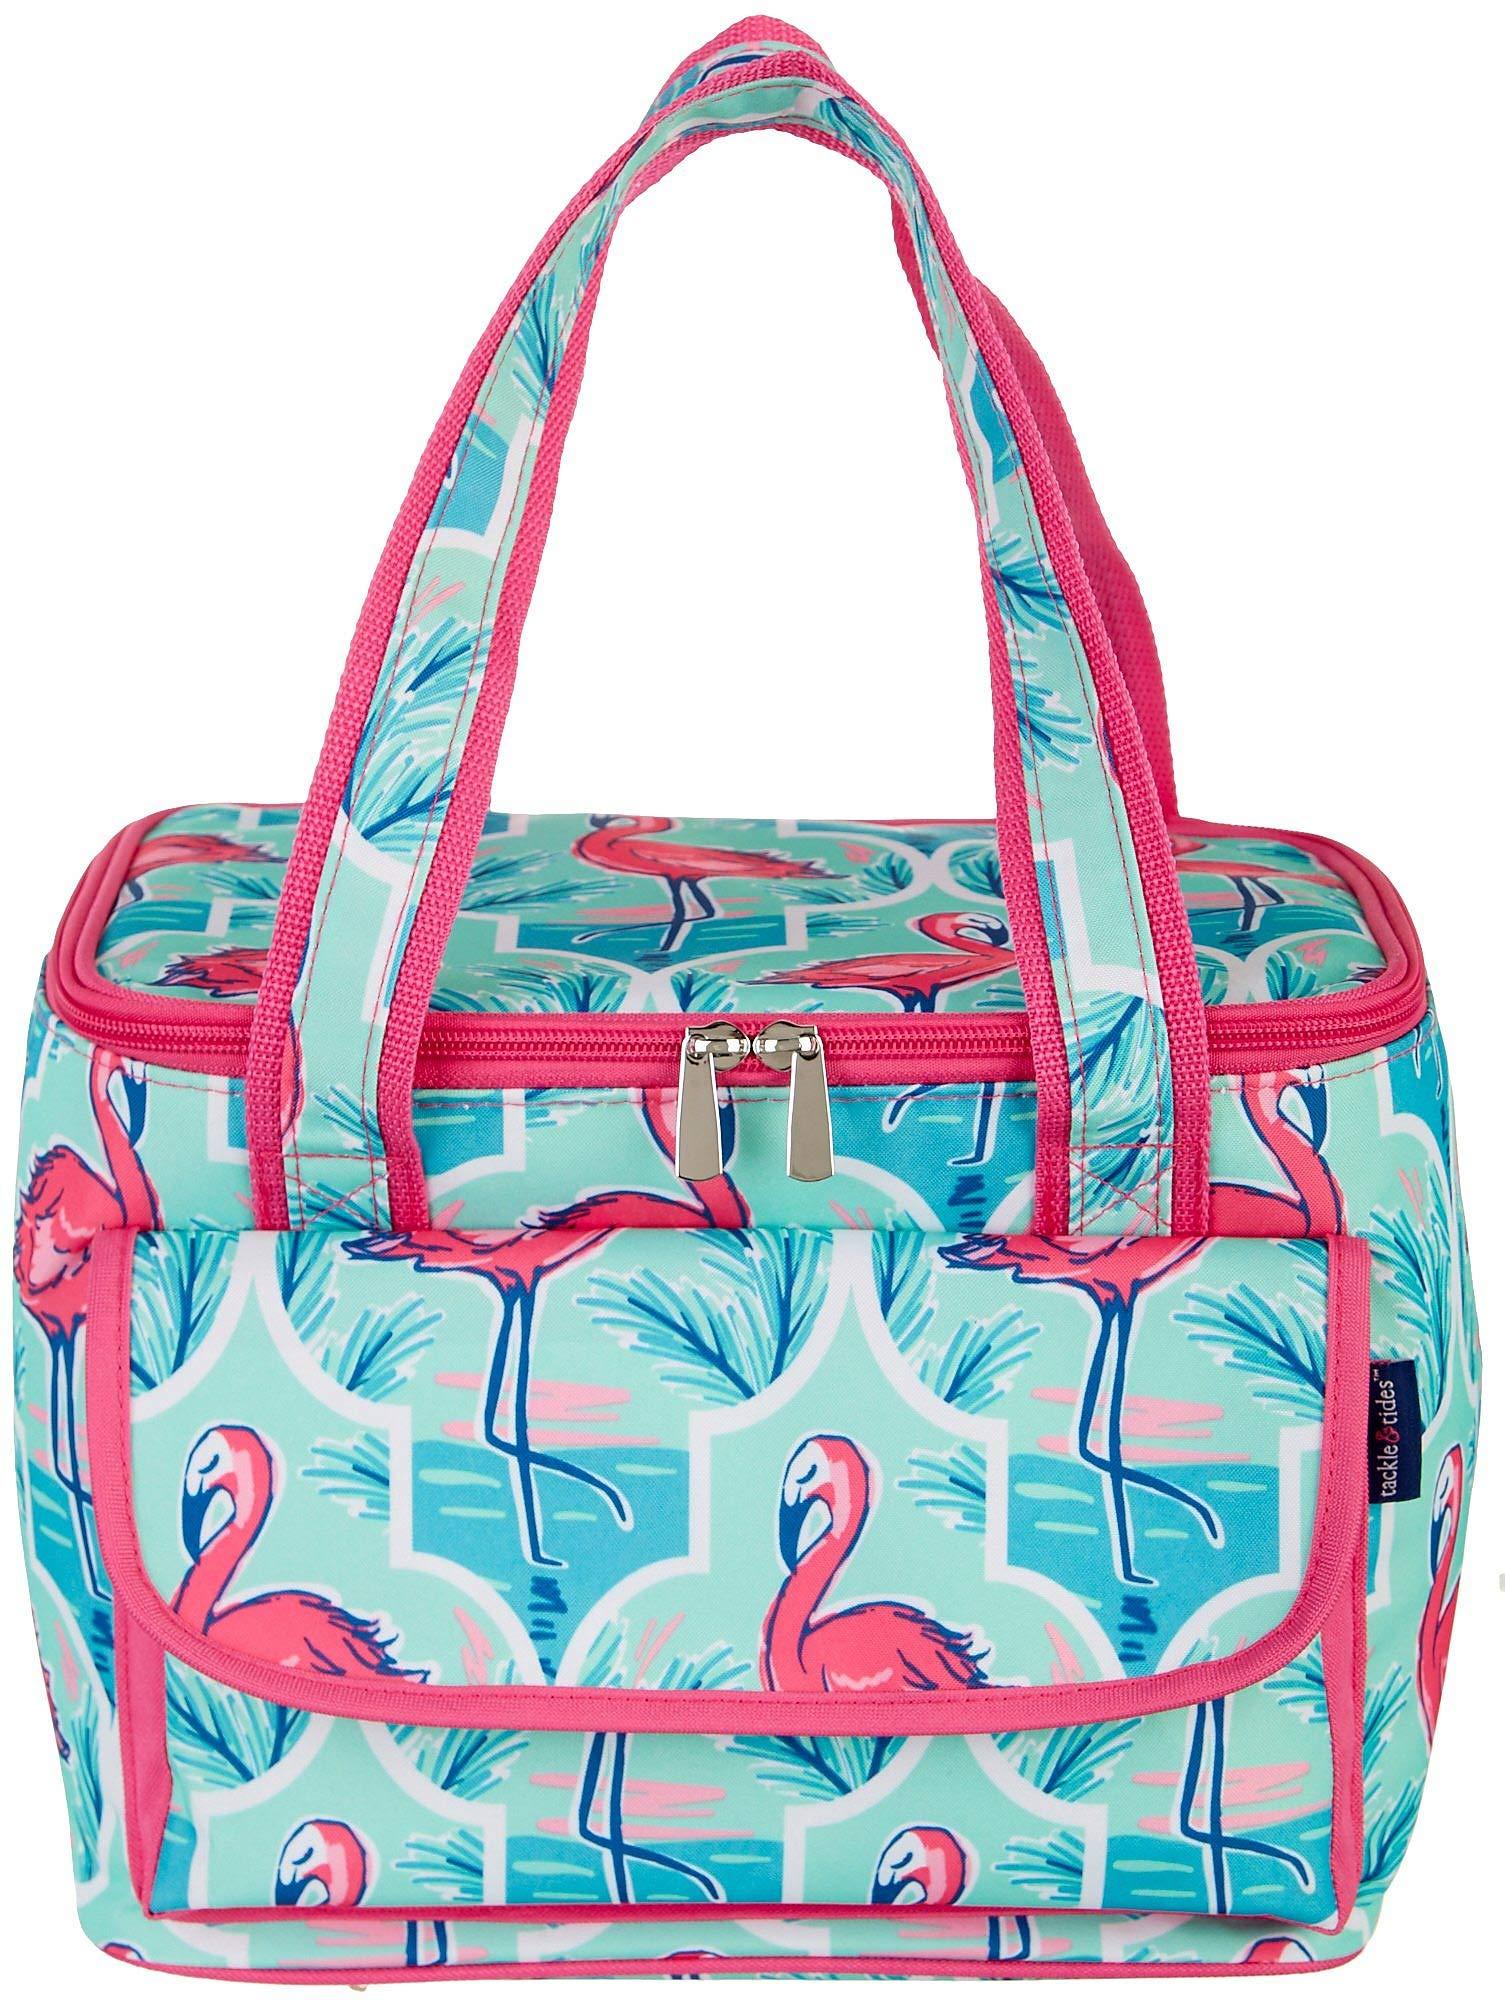 Tackle & Tides Flamingo Trellis 16 Can Cooler Tote One Size Aqua Blue//Pink